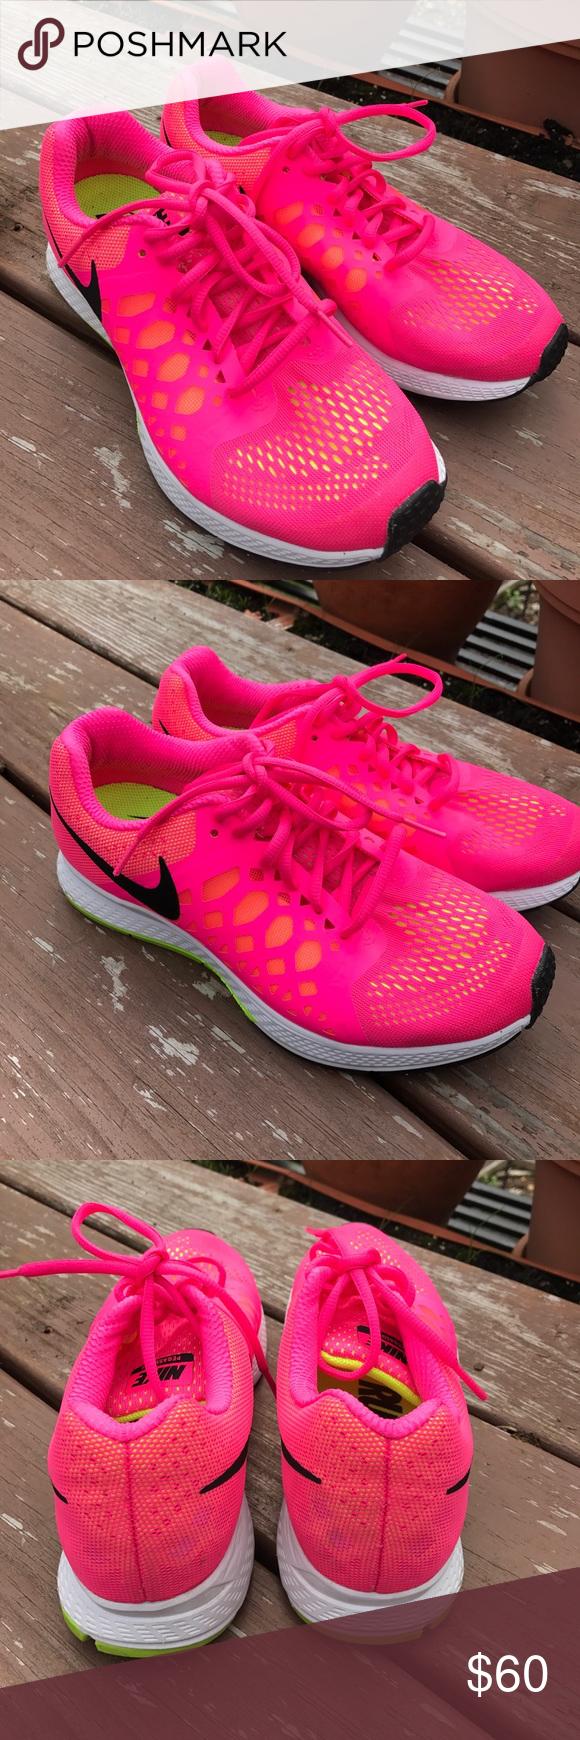 Nike zoom air Pegasus 31 running shoe NWOB. Never worn. Hot pink with black